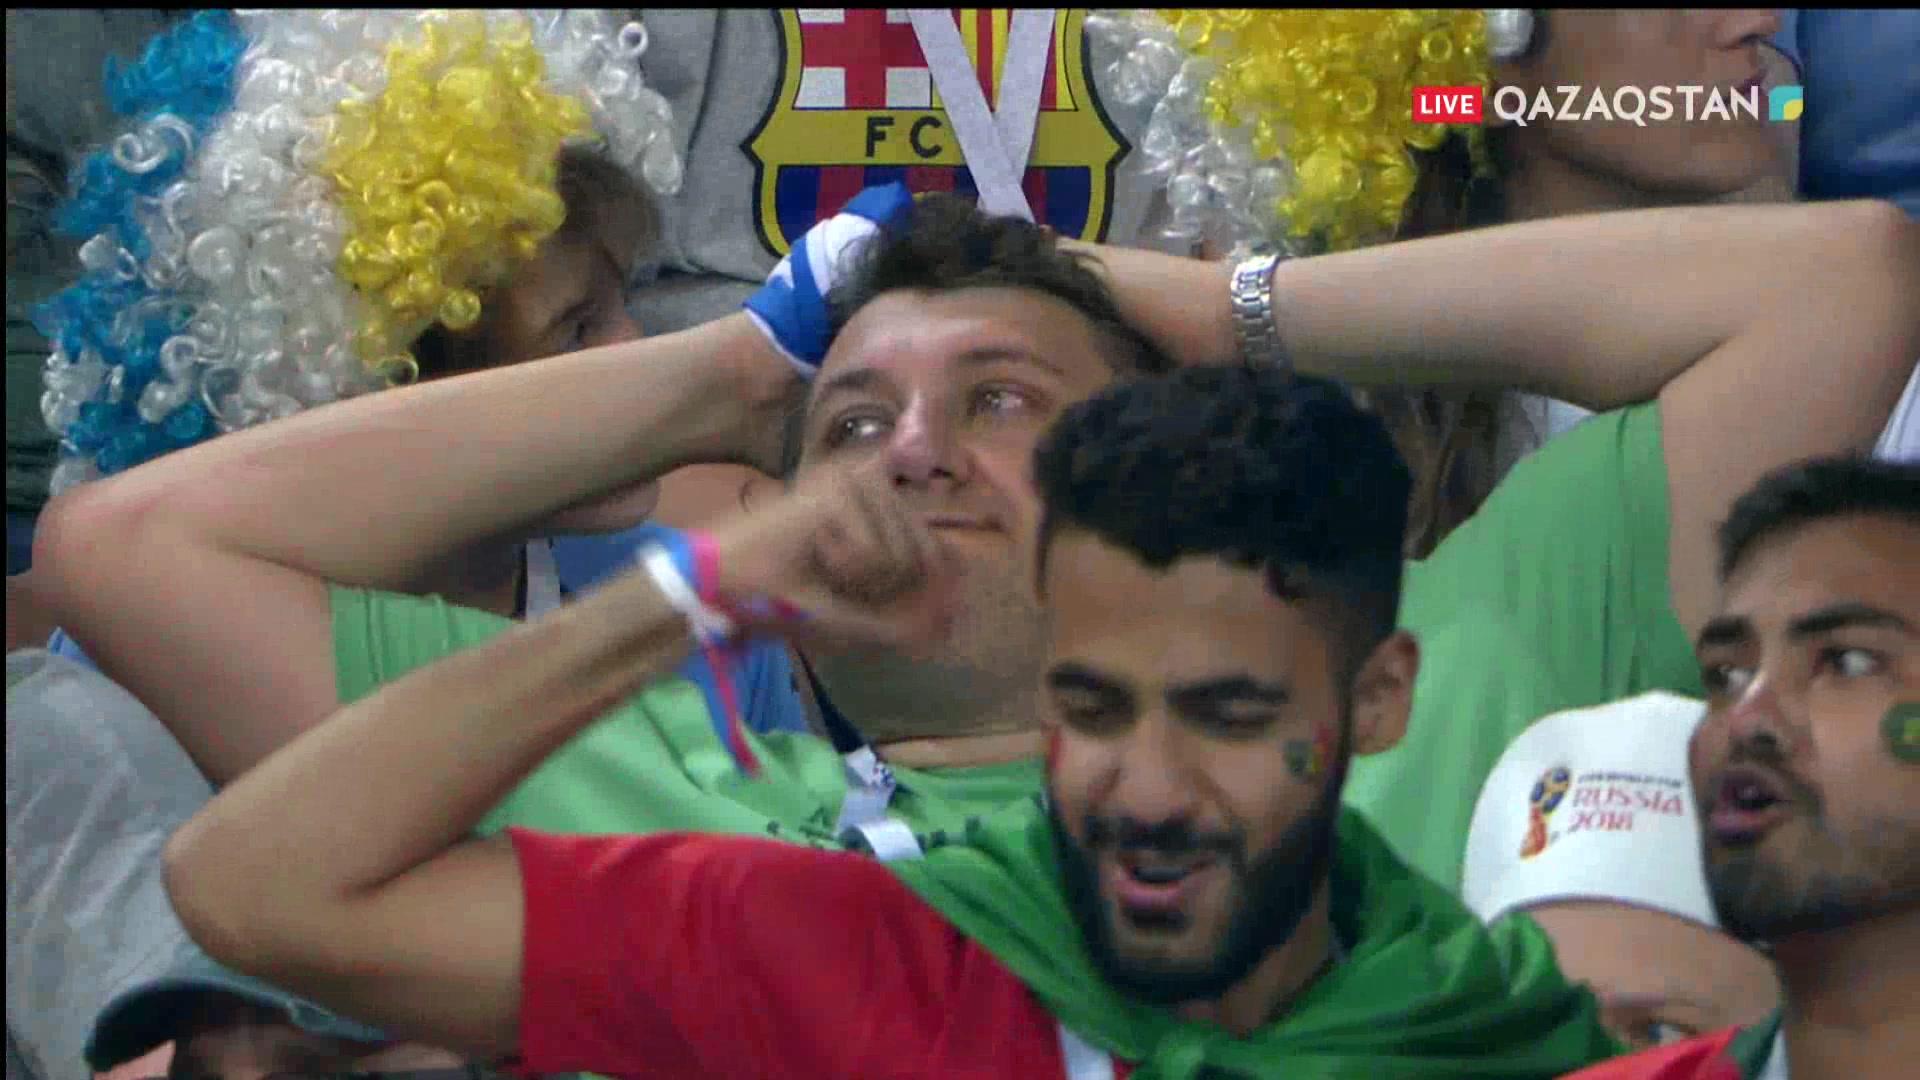 ӘЧ-2018. Уругвай - Португалия |2 – 1| Шолу